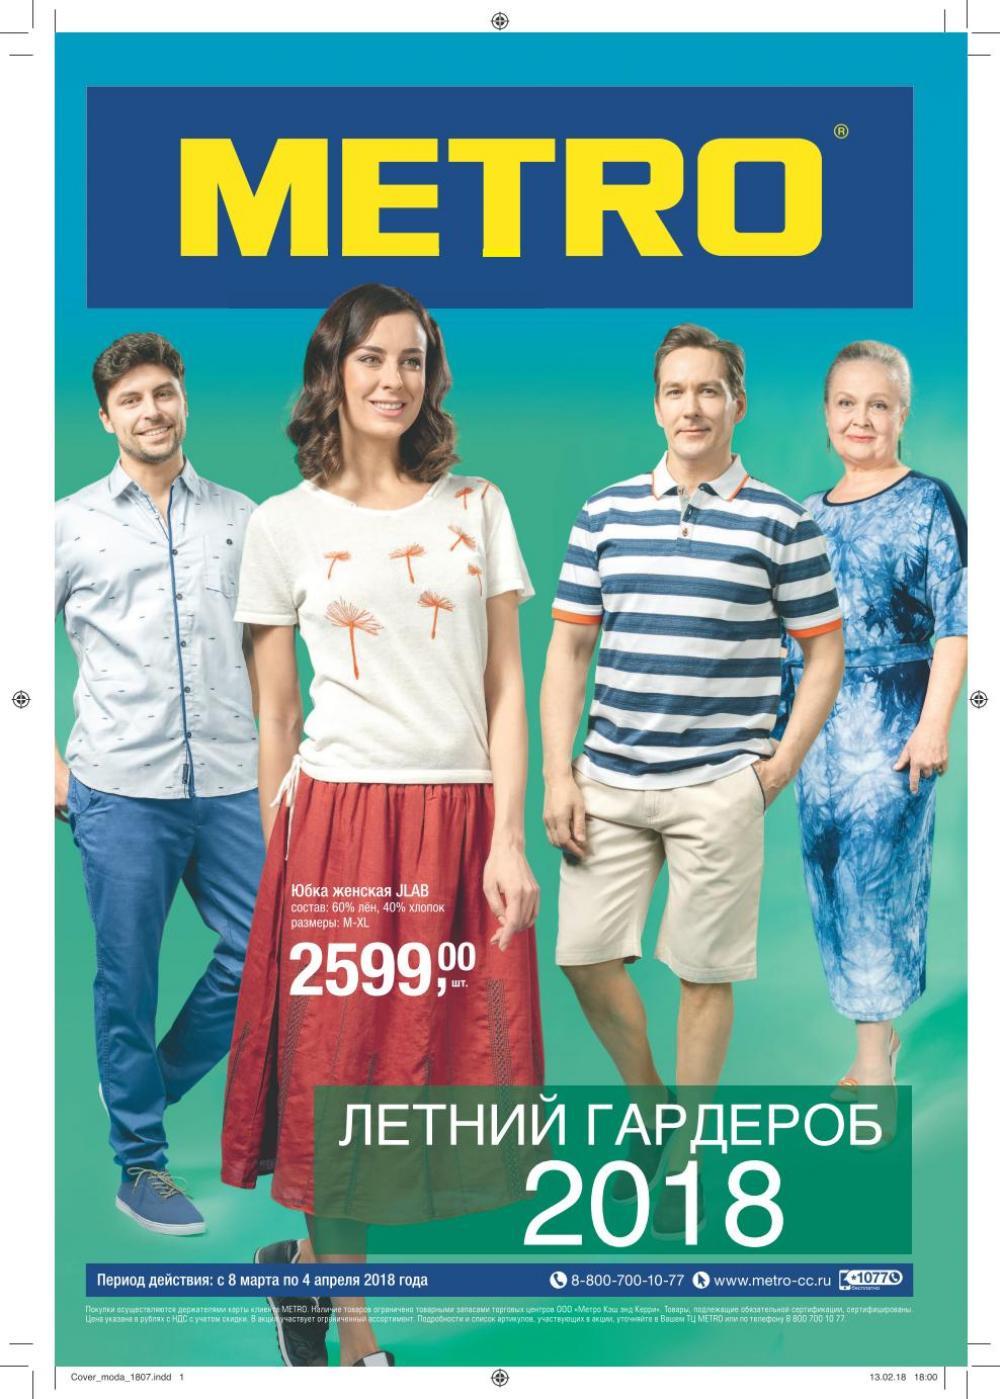 Каталог одежды лето 2018, Метро